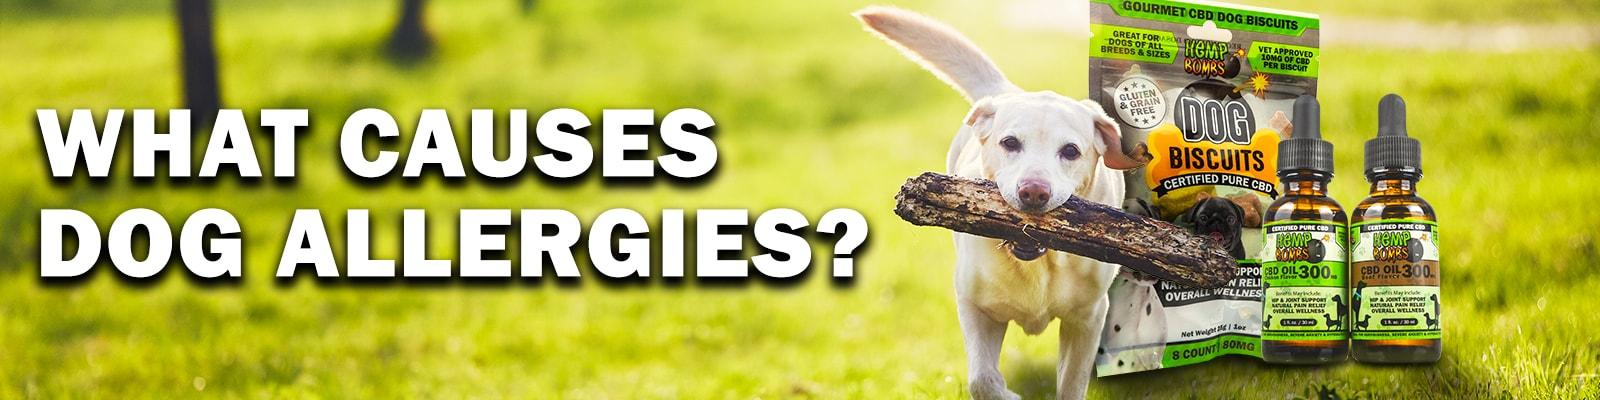 Hemp Bombs CBD For Dog Allergies